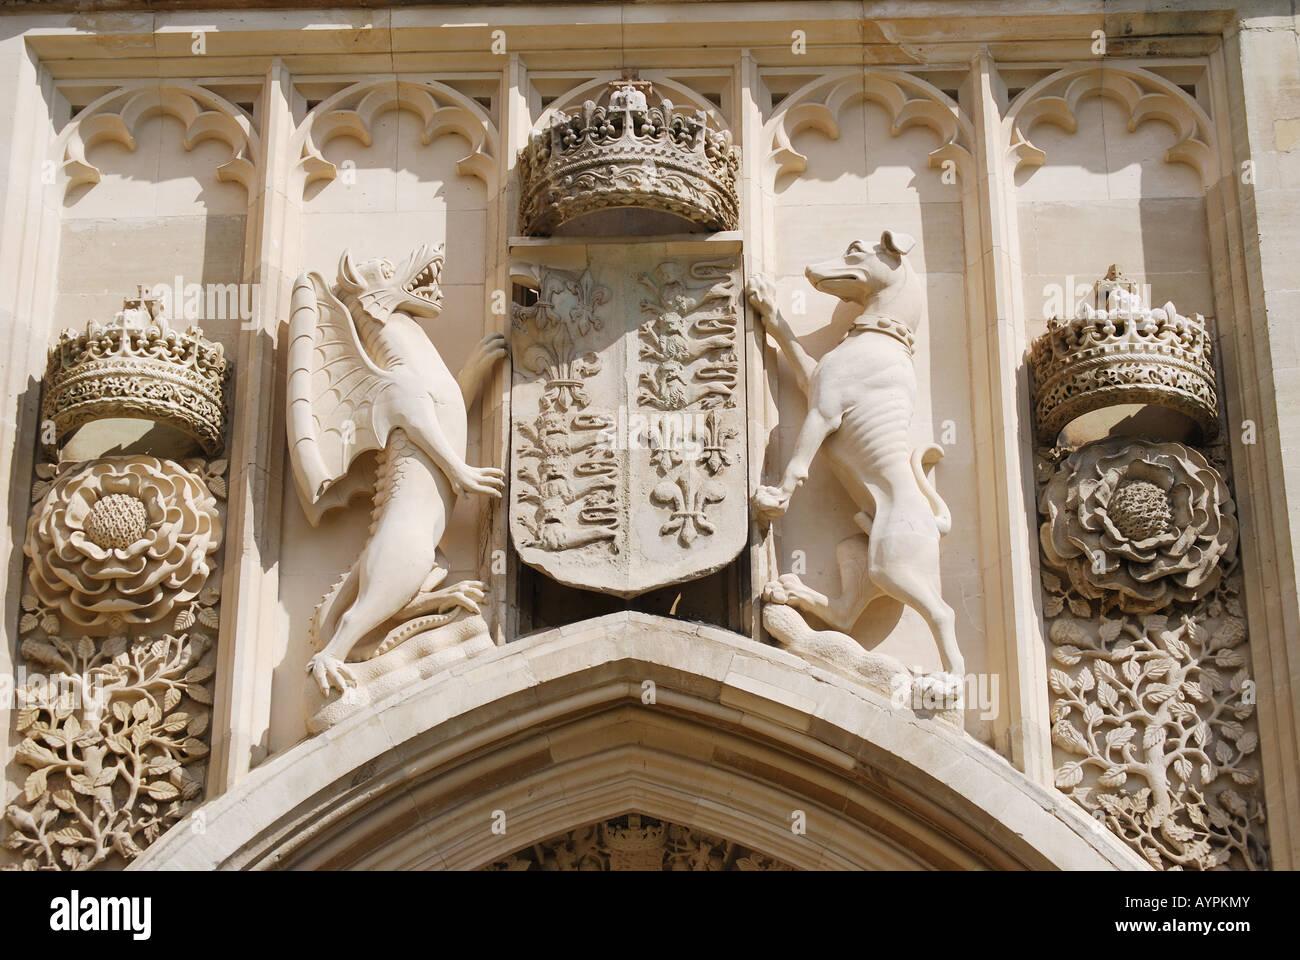 Stone Carvings Above Door King\\u0027s College Chapel King\\u0027s College Cambridge Cambridgeshire England United Kingdom & Door Kings \u0026 Old King\\u0027s School Shop With Crooked Blue Door Pezcame.Com